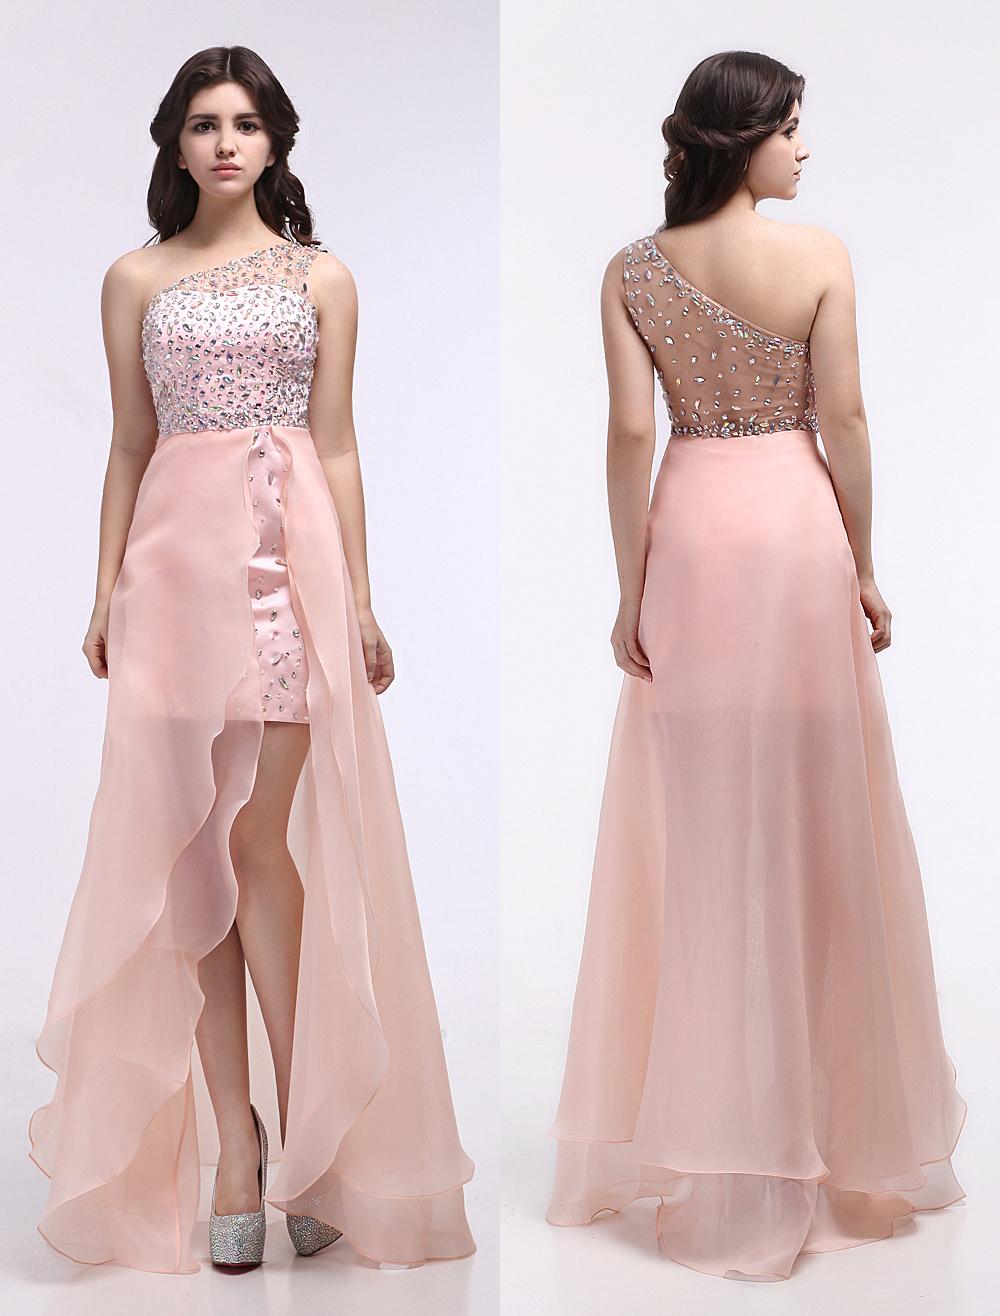 Peach Evening Dress Illusion Rhinestone Beaded Prom Dress Organza One Shoulder Asymmetrical Floor Length Party Dress